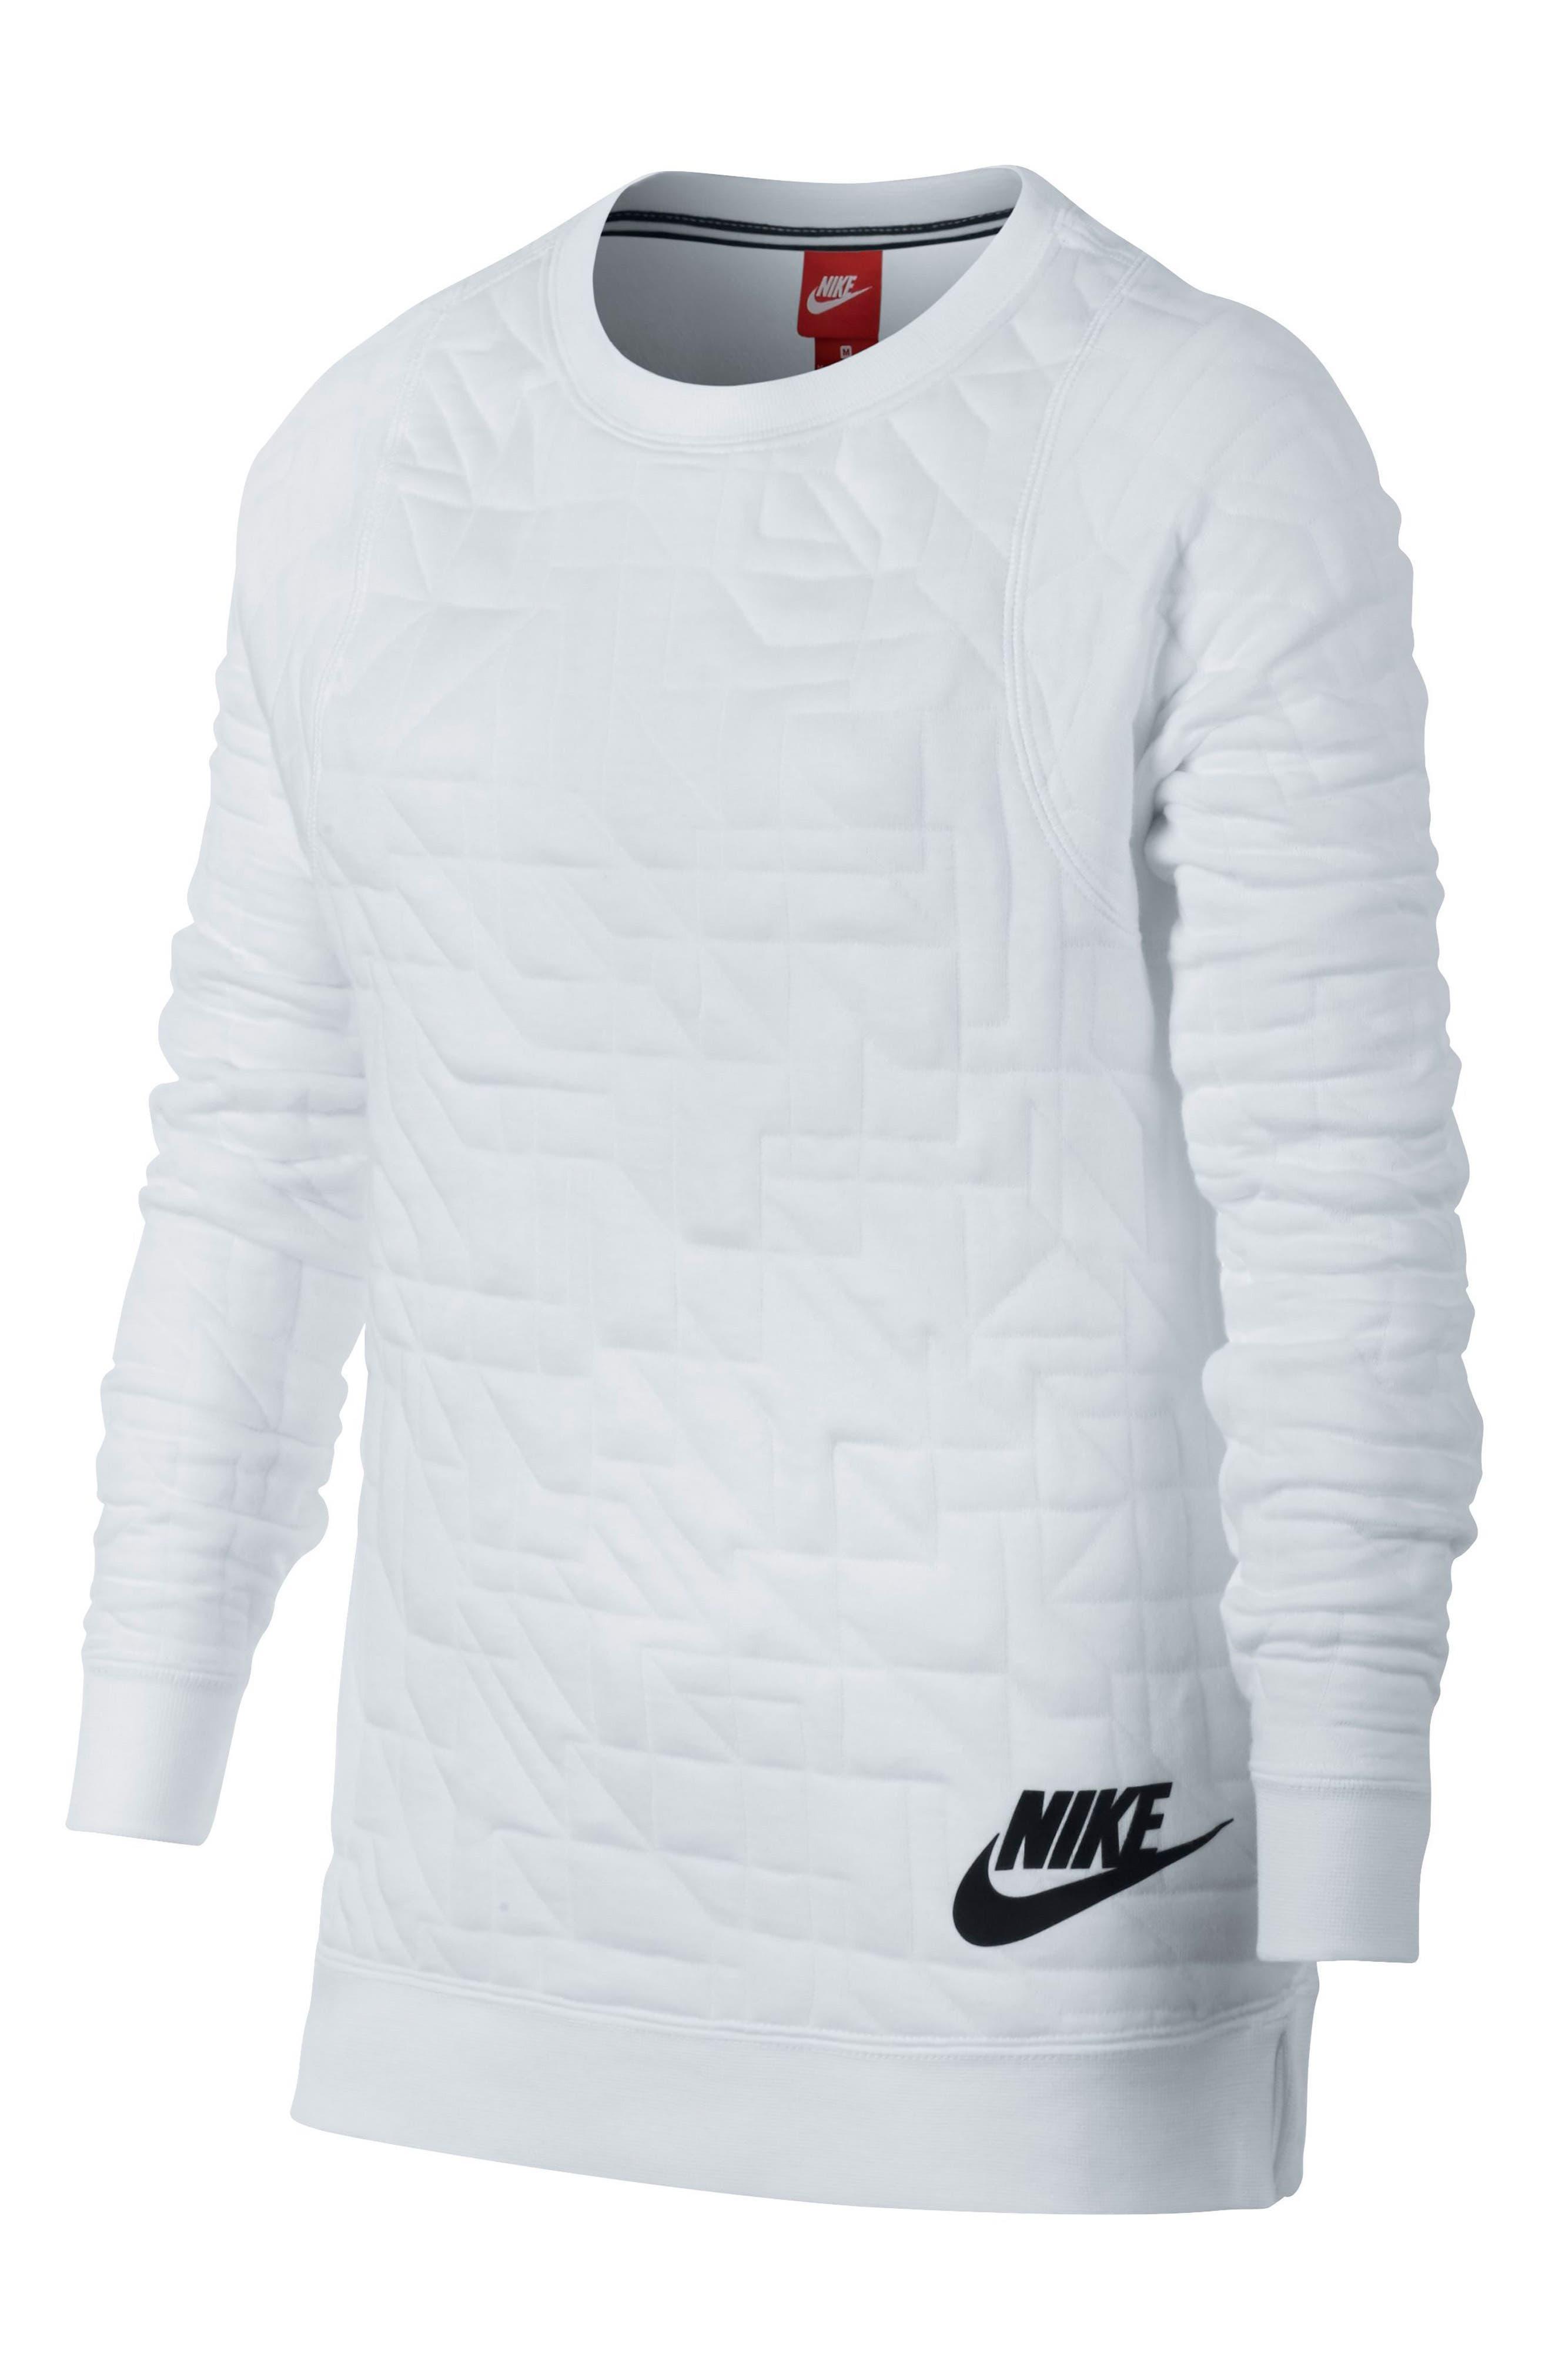 Modern Matelassé Sweatshirt,                             Main thumbnail 1, color,                             White/ Black